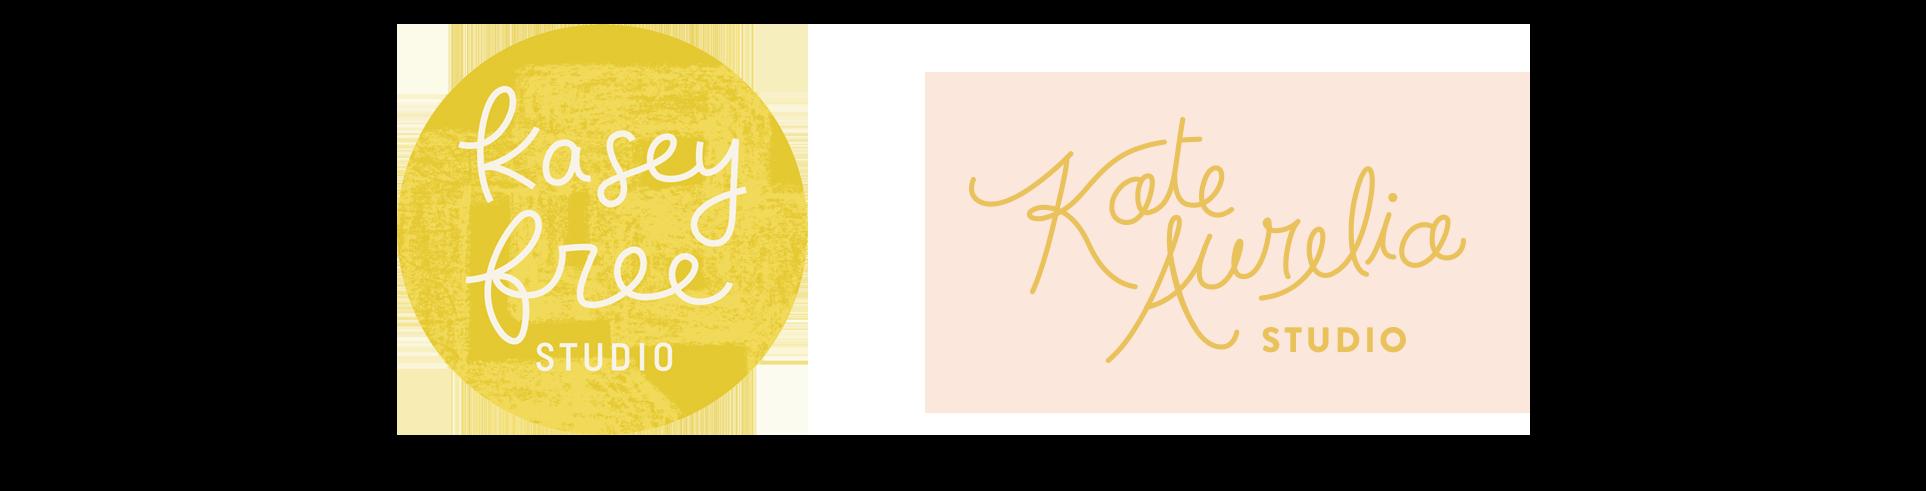 KateAureliaStudio_KaseyFreeStudio_logos.png